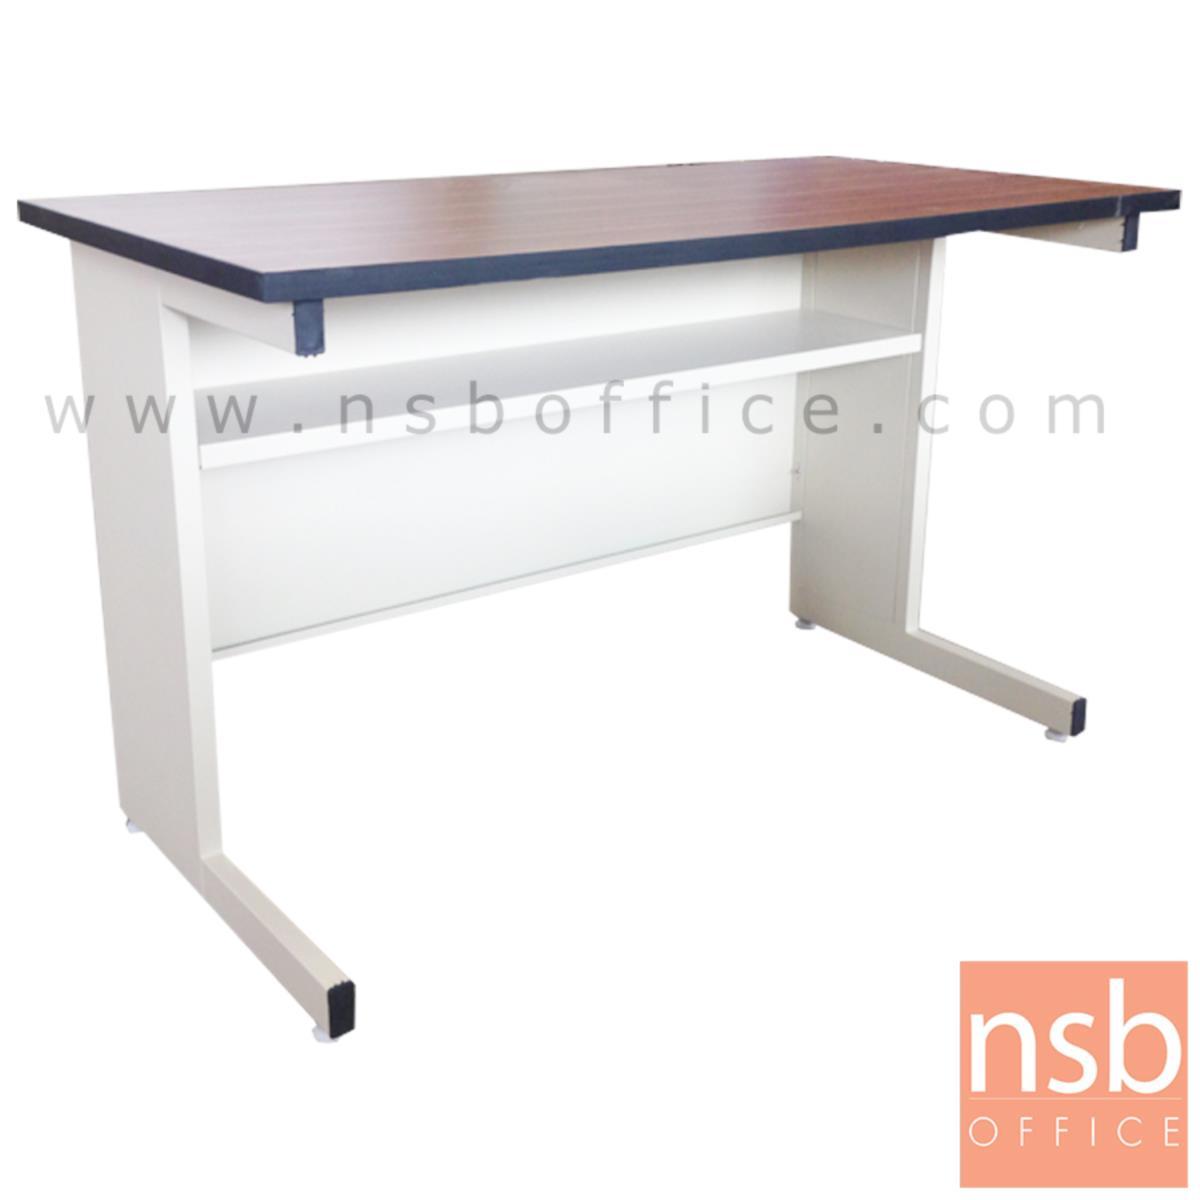 A05A038:โต๊ะประชุมตรง รุ่น Amolika (อโมลิก้า) ขนาด 119.7W ,152.5W ,182.5W cm.  ขาเหล็กตัวแอล